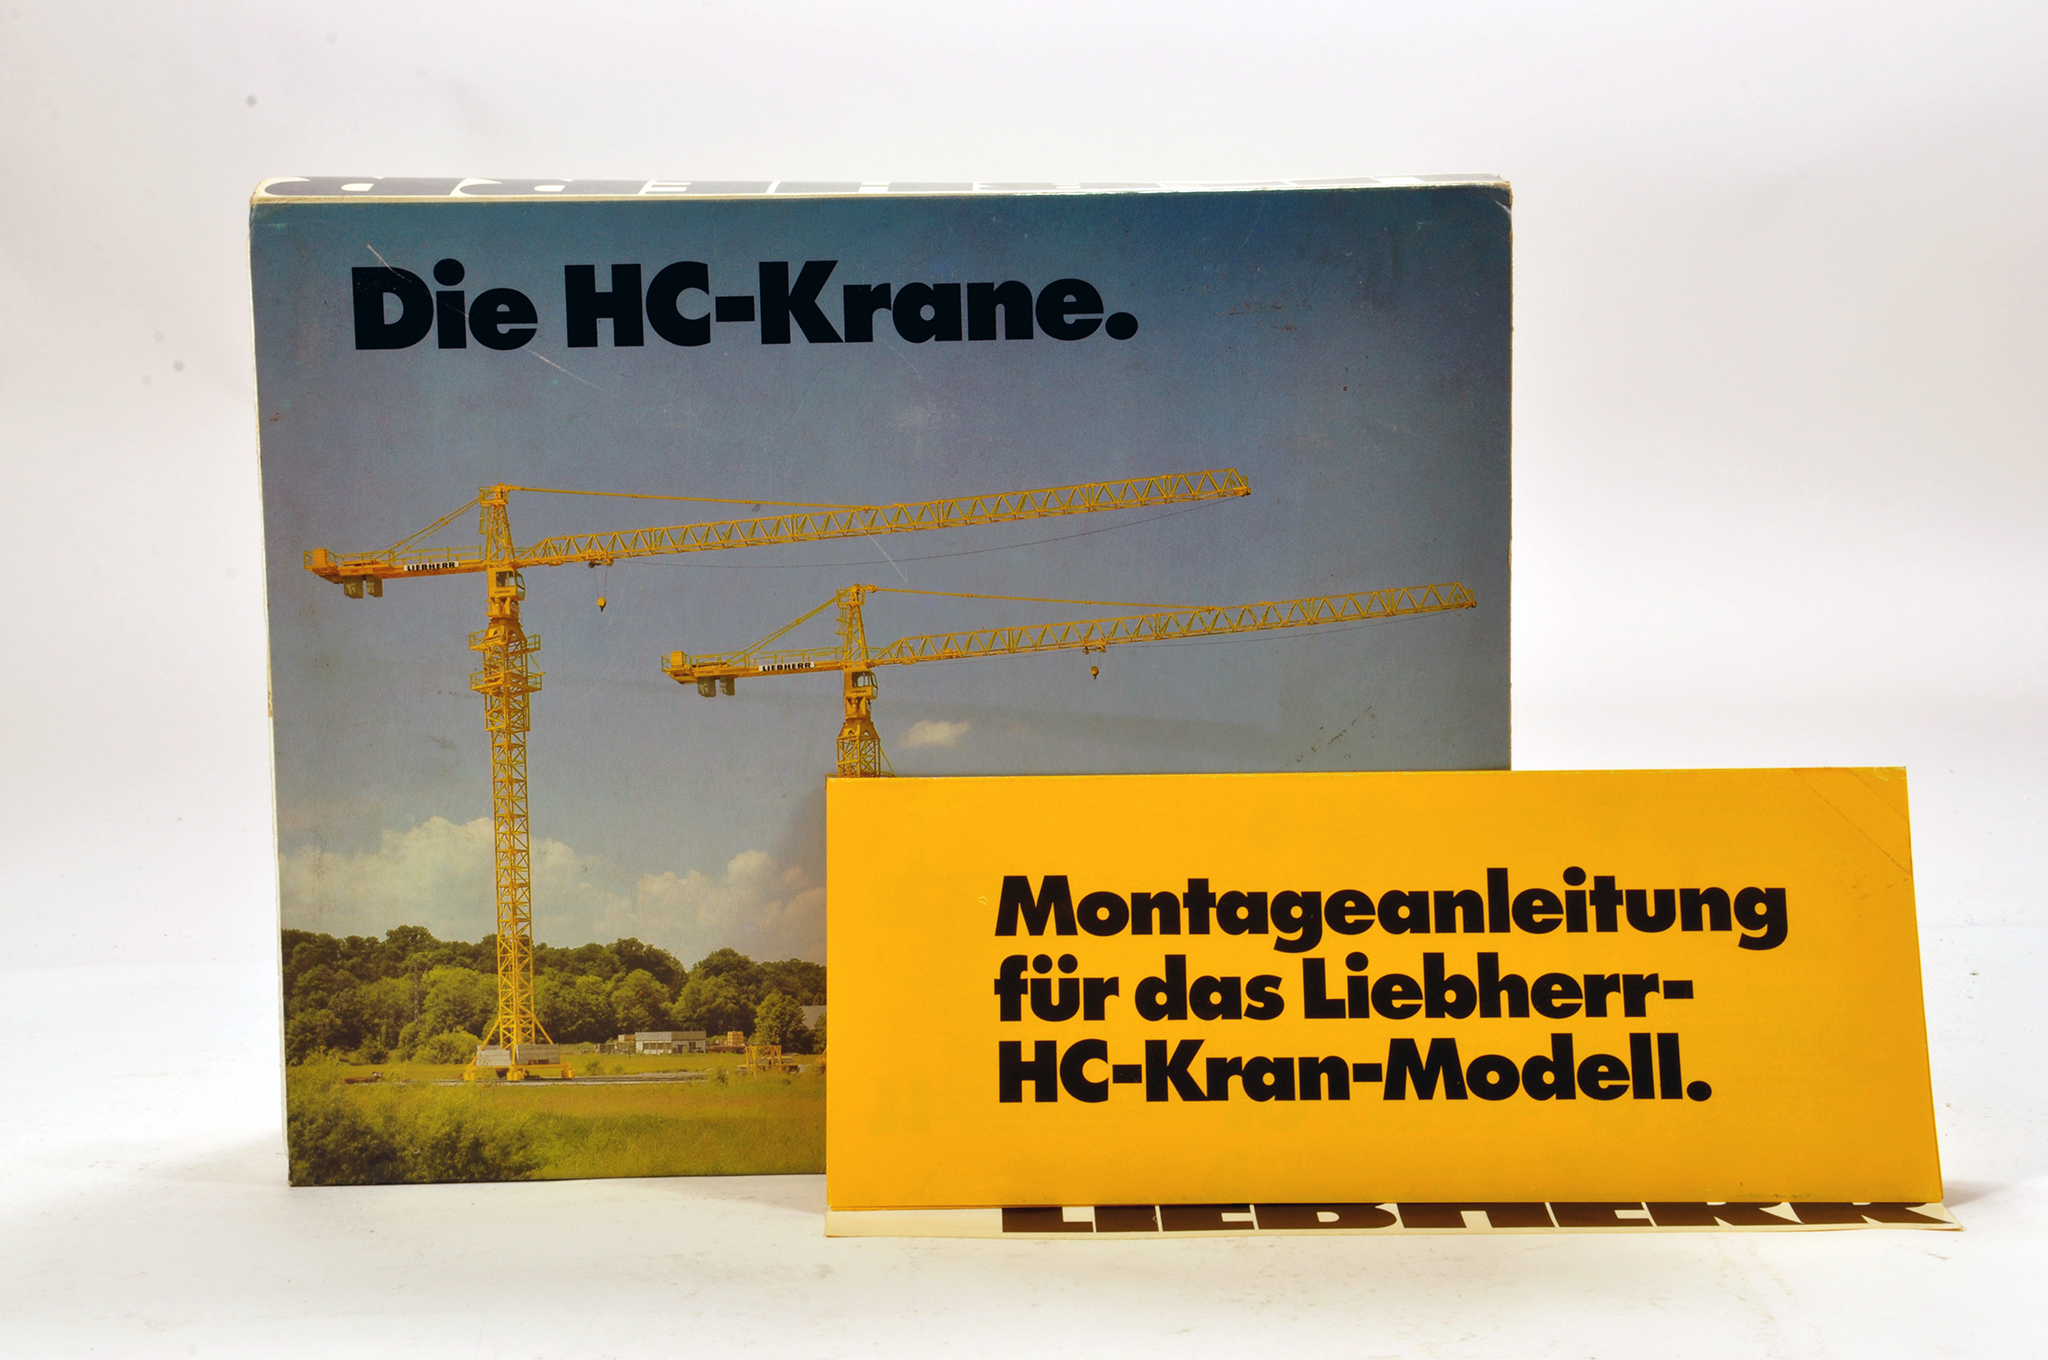 Lot 322 - Conrad 1/87 construction issue comprising Liebherr HC Tower Crane. E to NM.